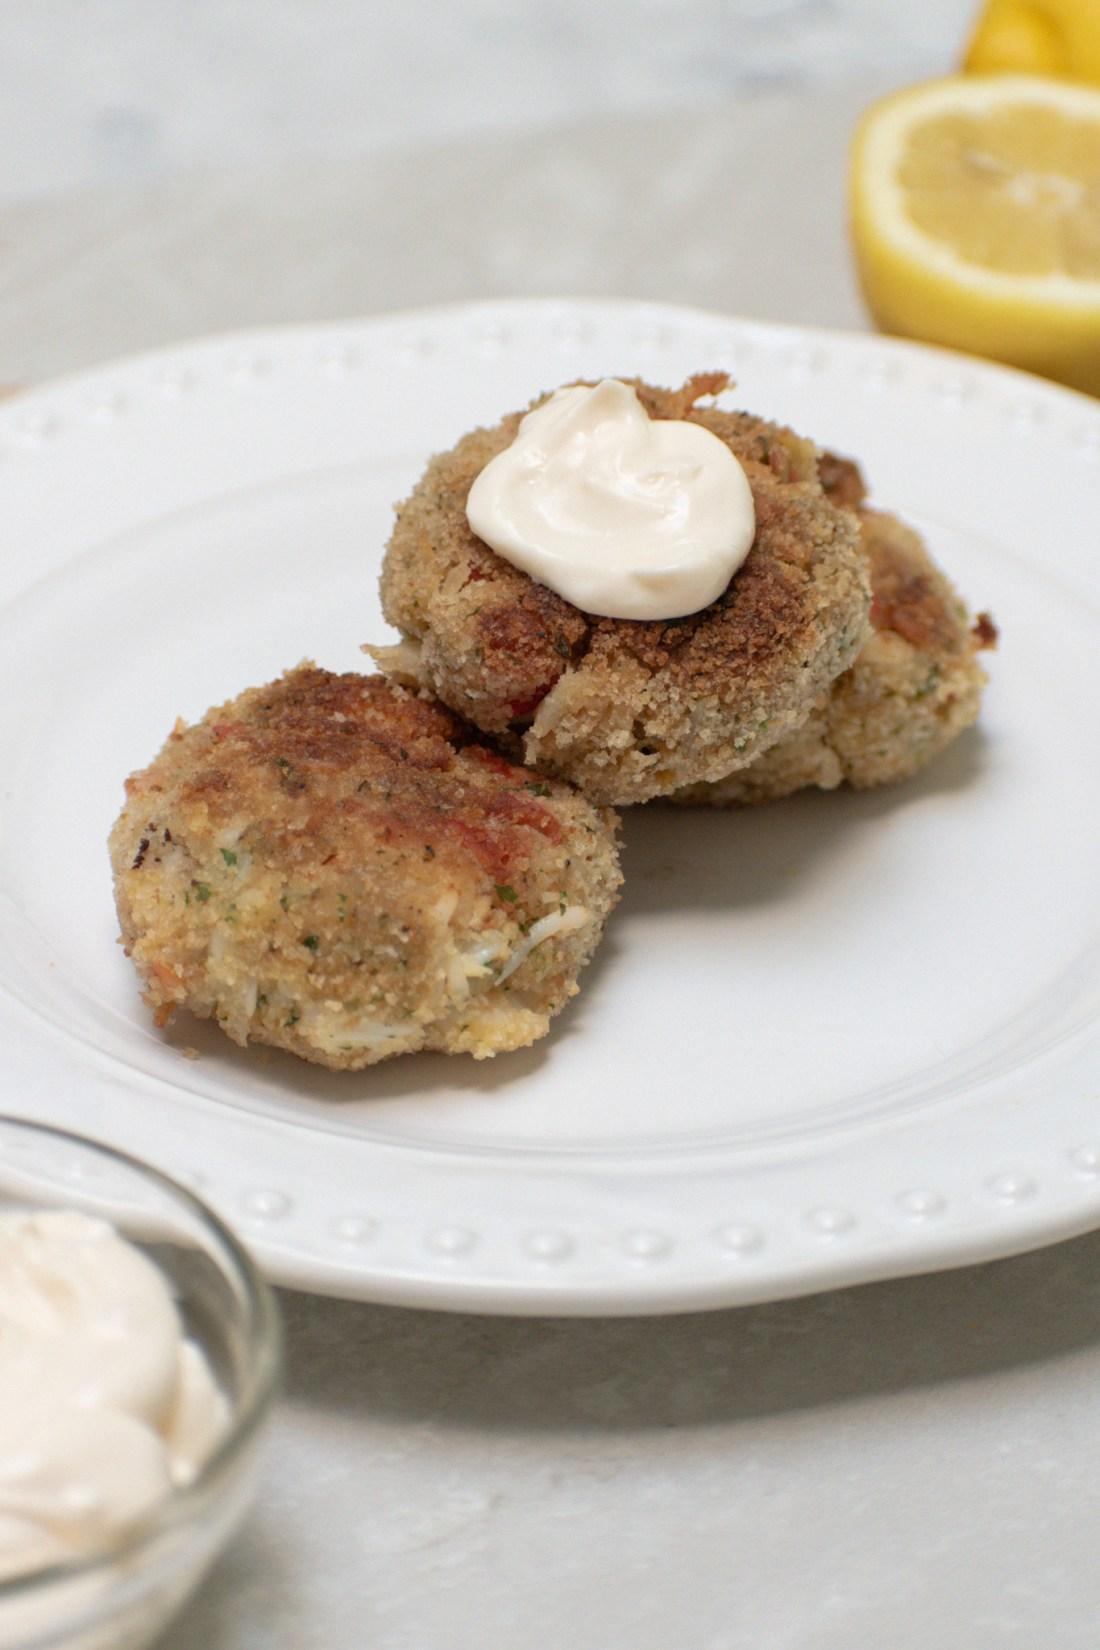 Crab Cakes with Lemon Garlic Aioli